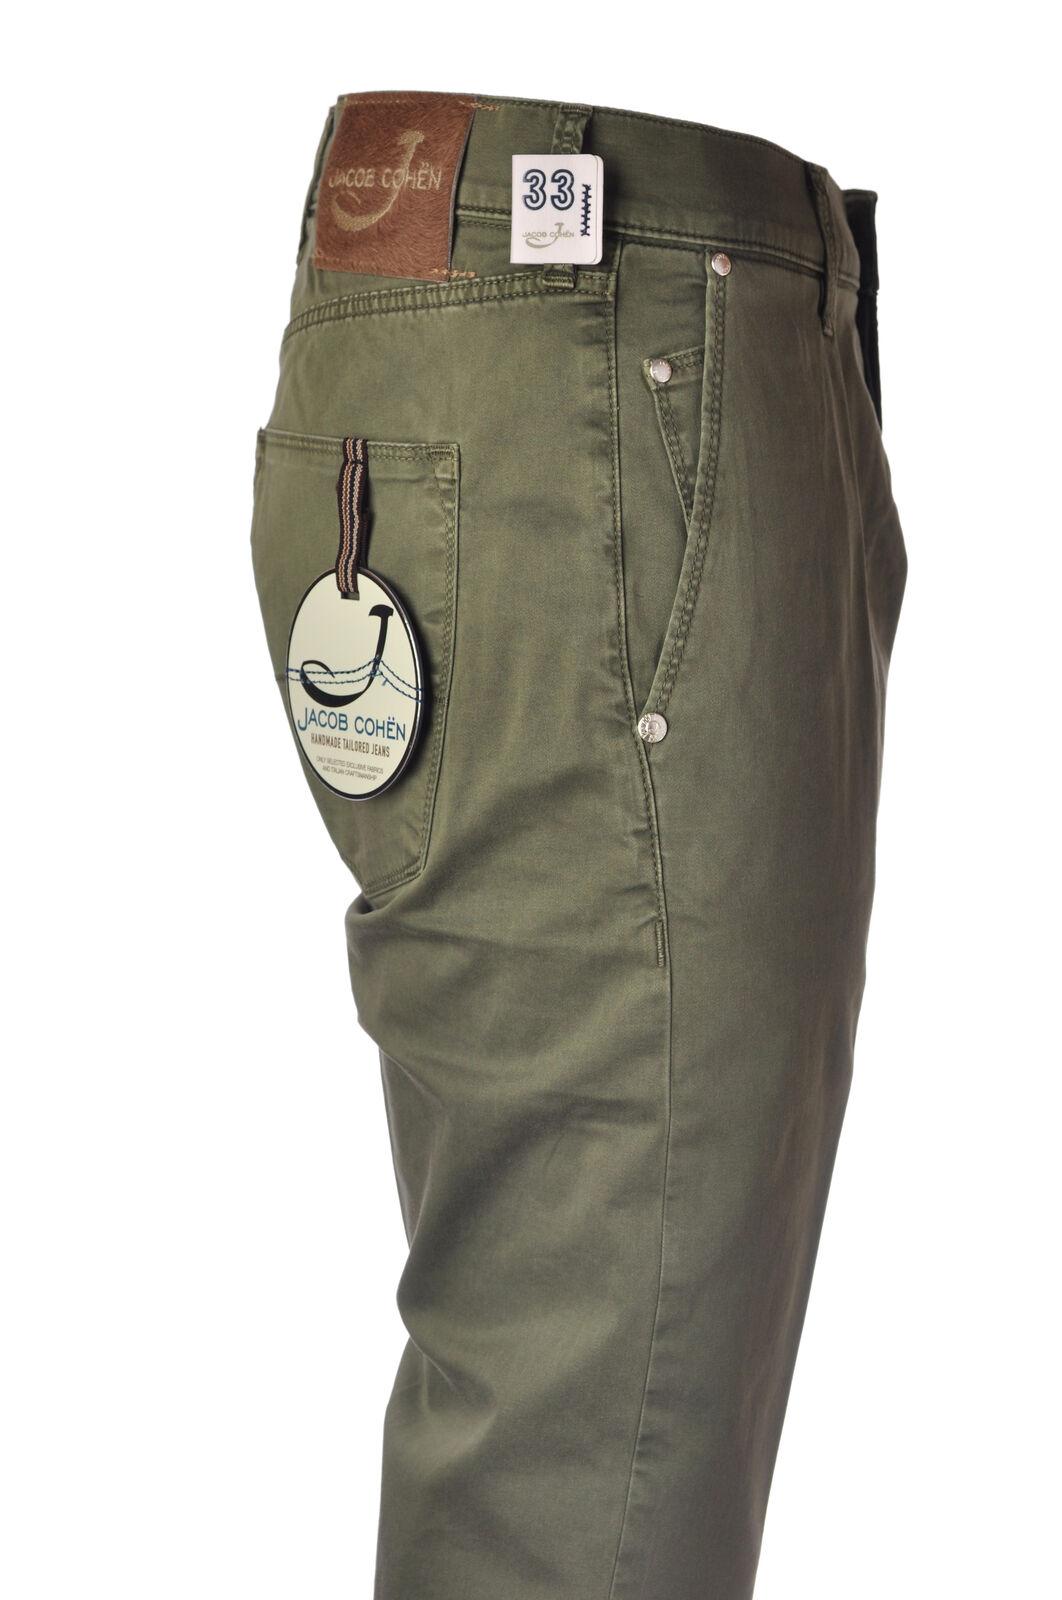 Jacob Cohen - Pants-Pants - Man - Green - 4848202F184711